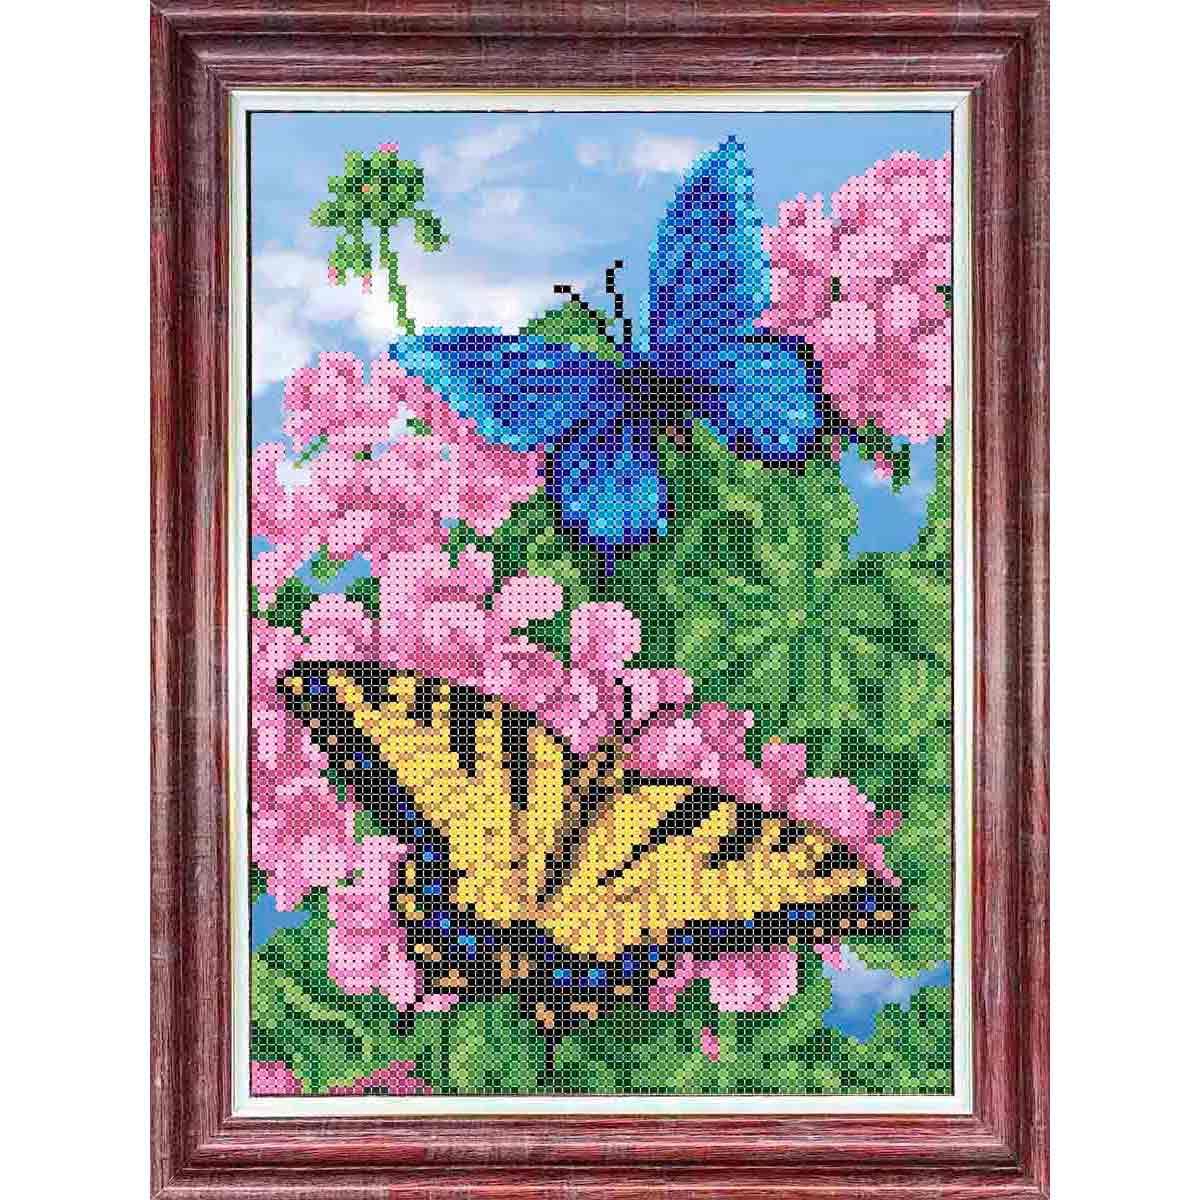 КББ-4008 Канва с рисунком для бисера 'Бабочки в цветах' А4